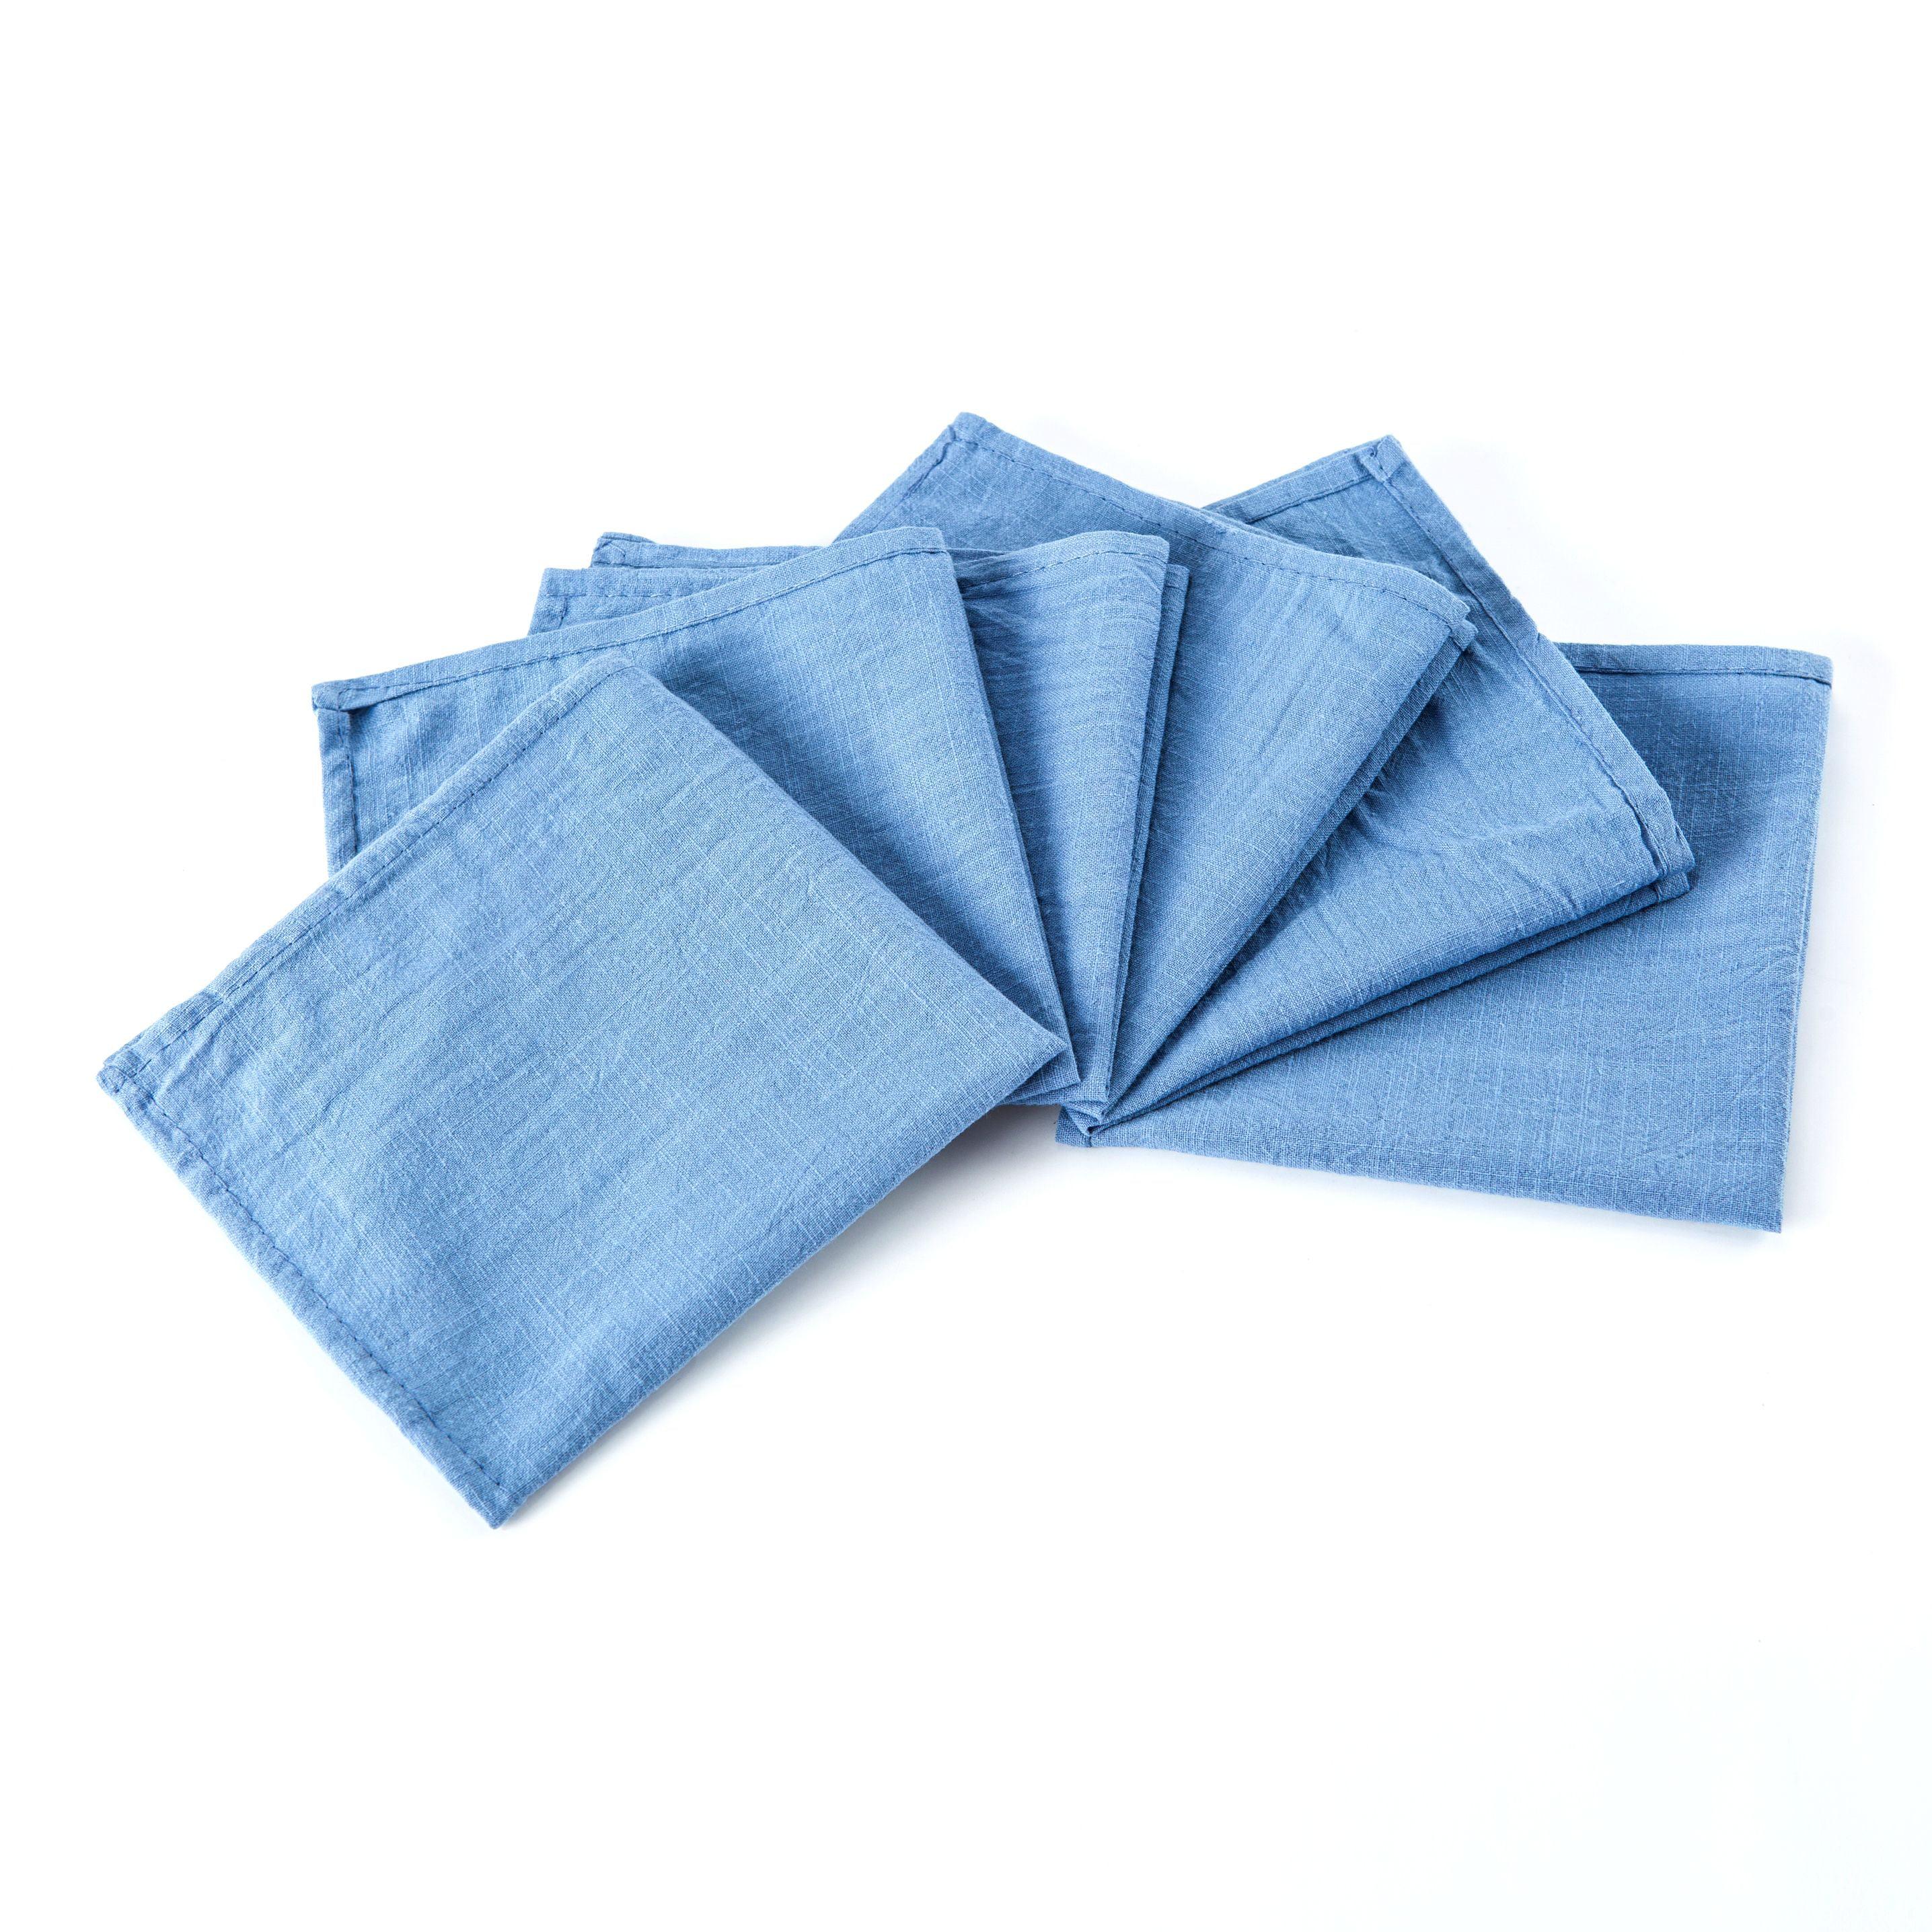 Mint cloth napkins set of 8 Mint wedding napkins Beach wedding table decor